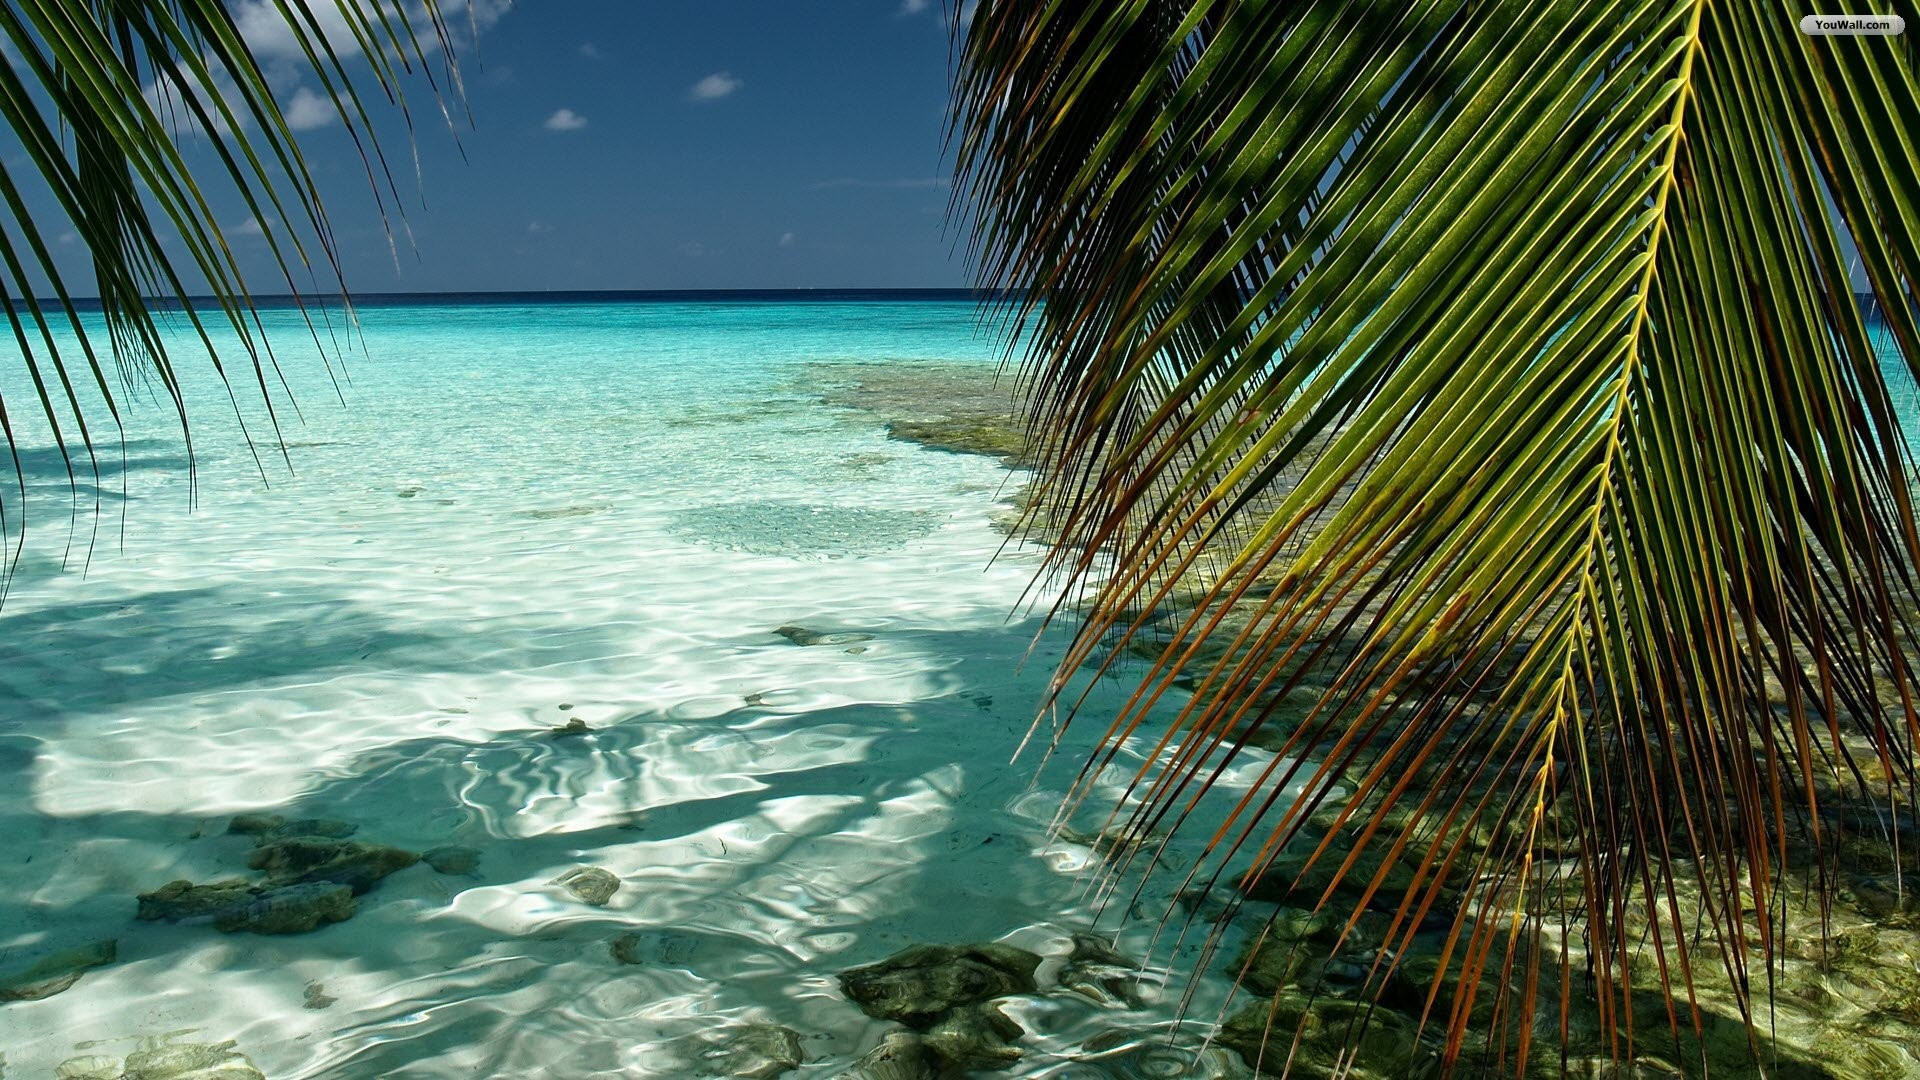 hd-wallpapers-wallpaper-beach-house-beautiful-wonderful-tropical-